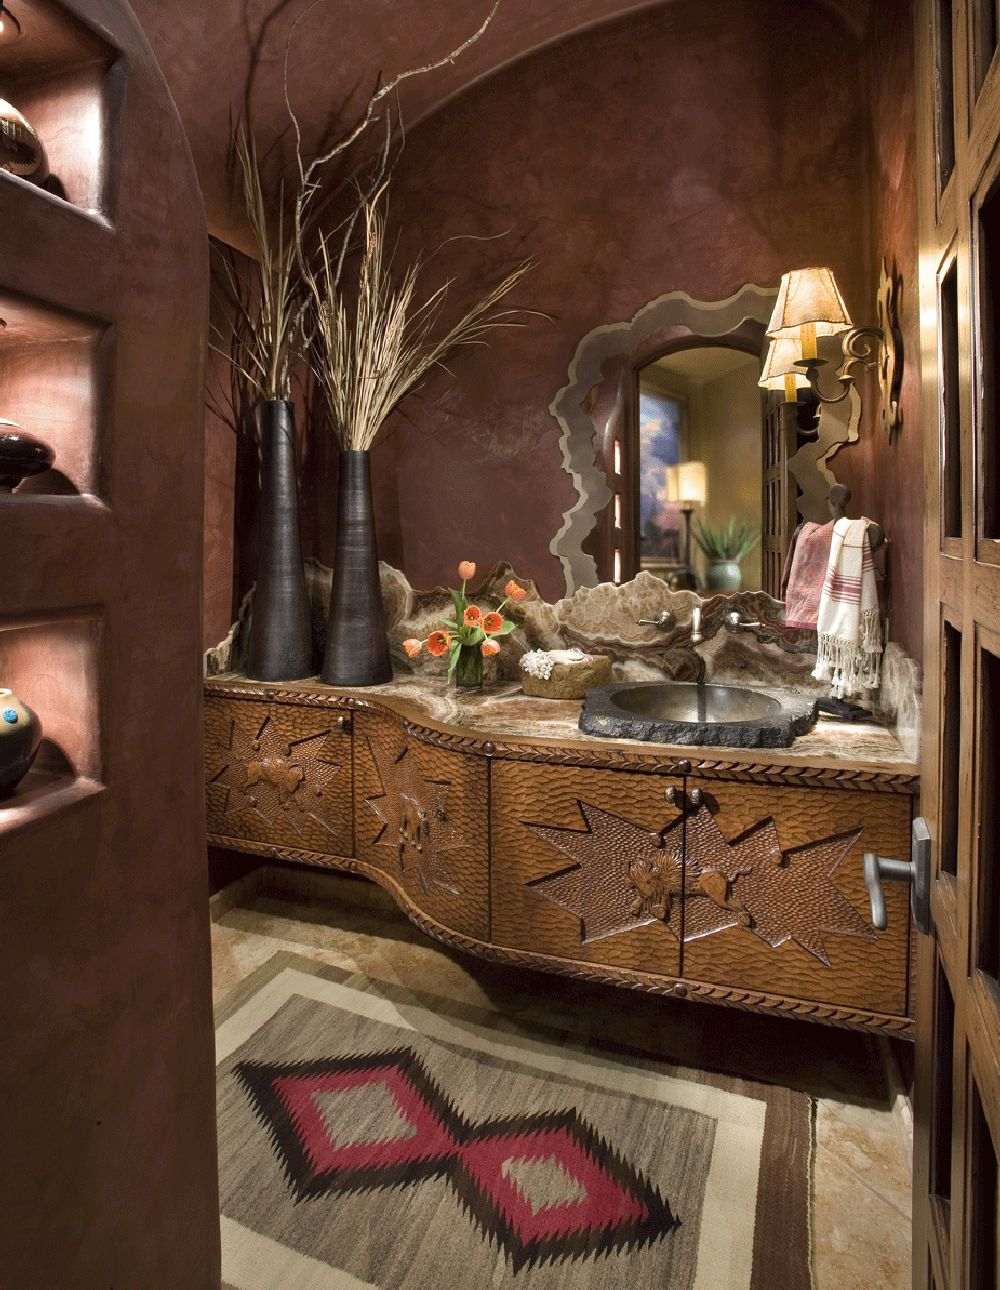 adelaparvu.com despre bucatarie in casa cu arhitectura organica, arhitect Lee Hutchison, Urban Design Associates (4)